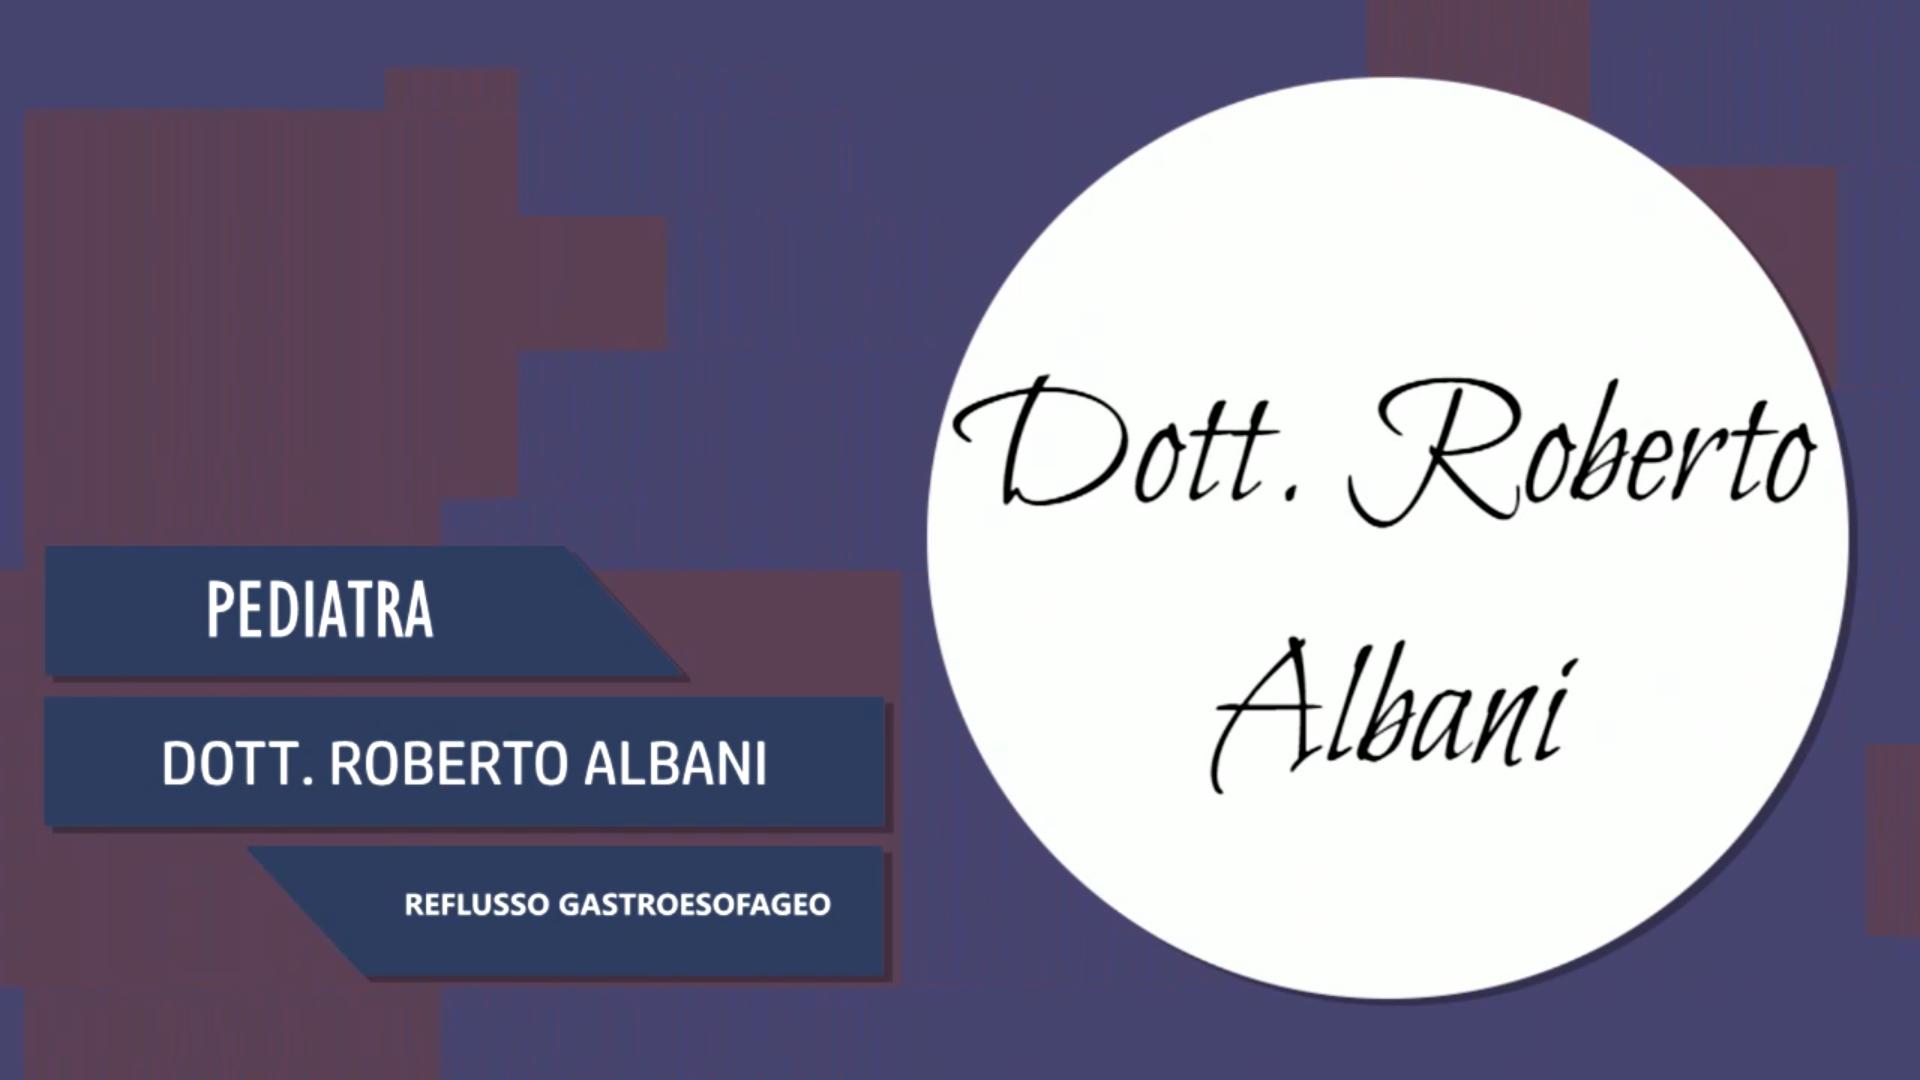 Intervista al Dott. Roberto Albani – Reflusso gastroesofageo